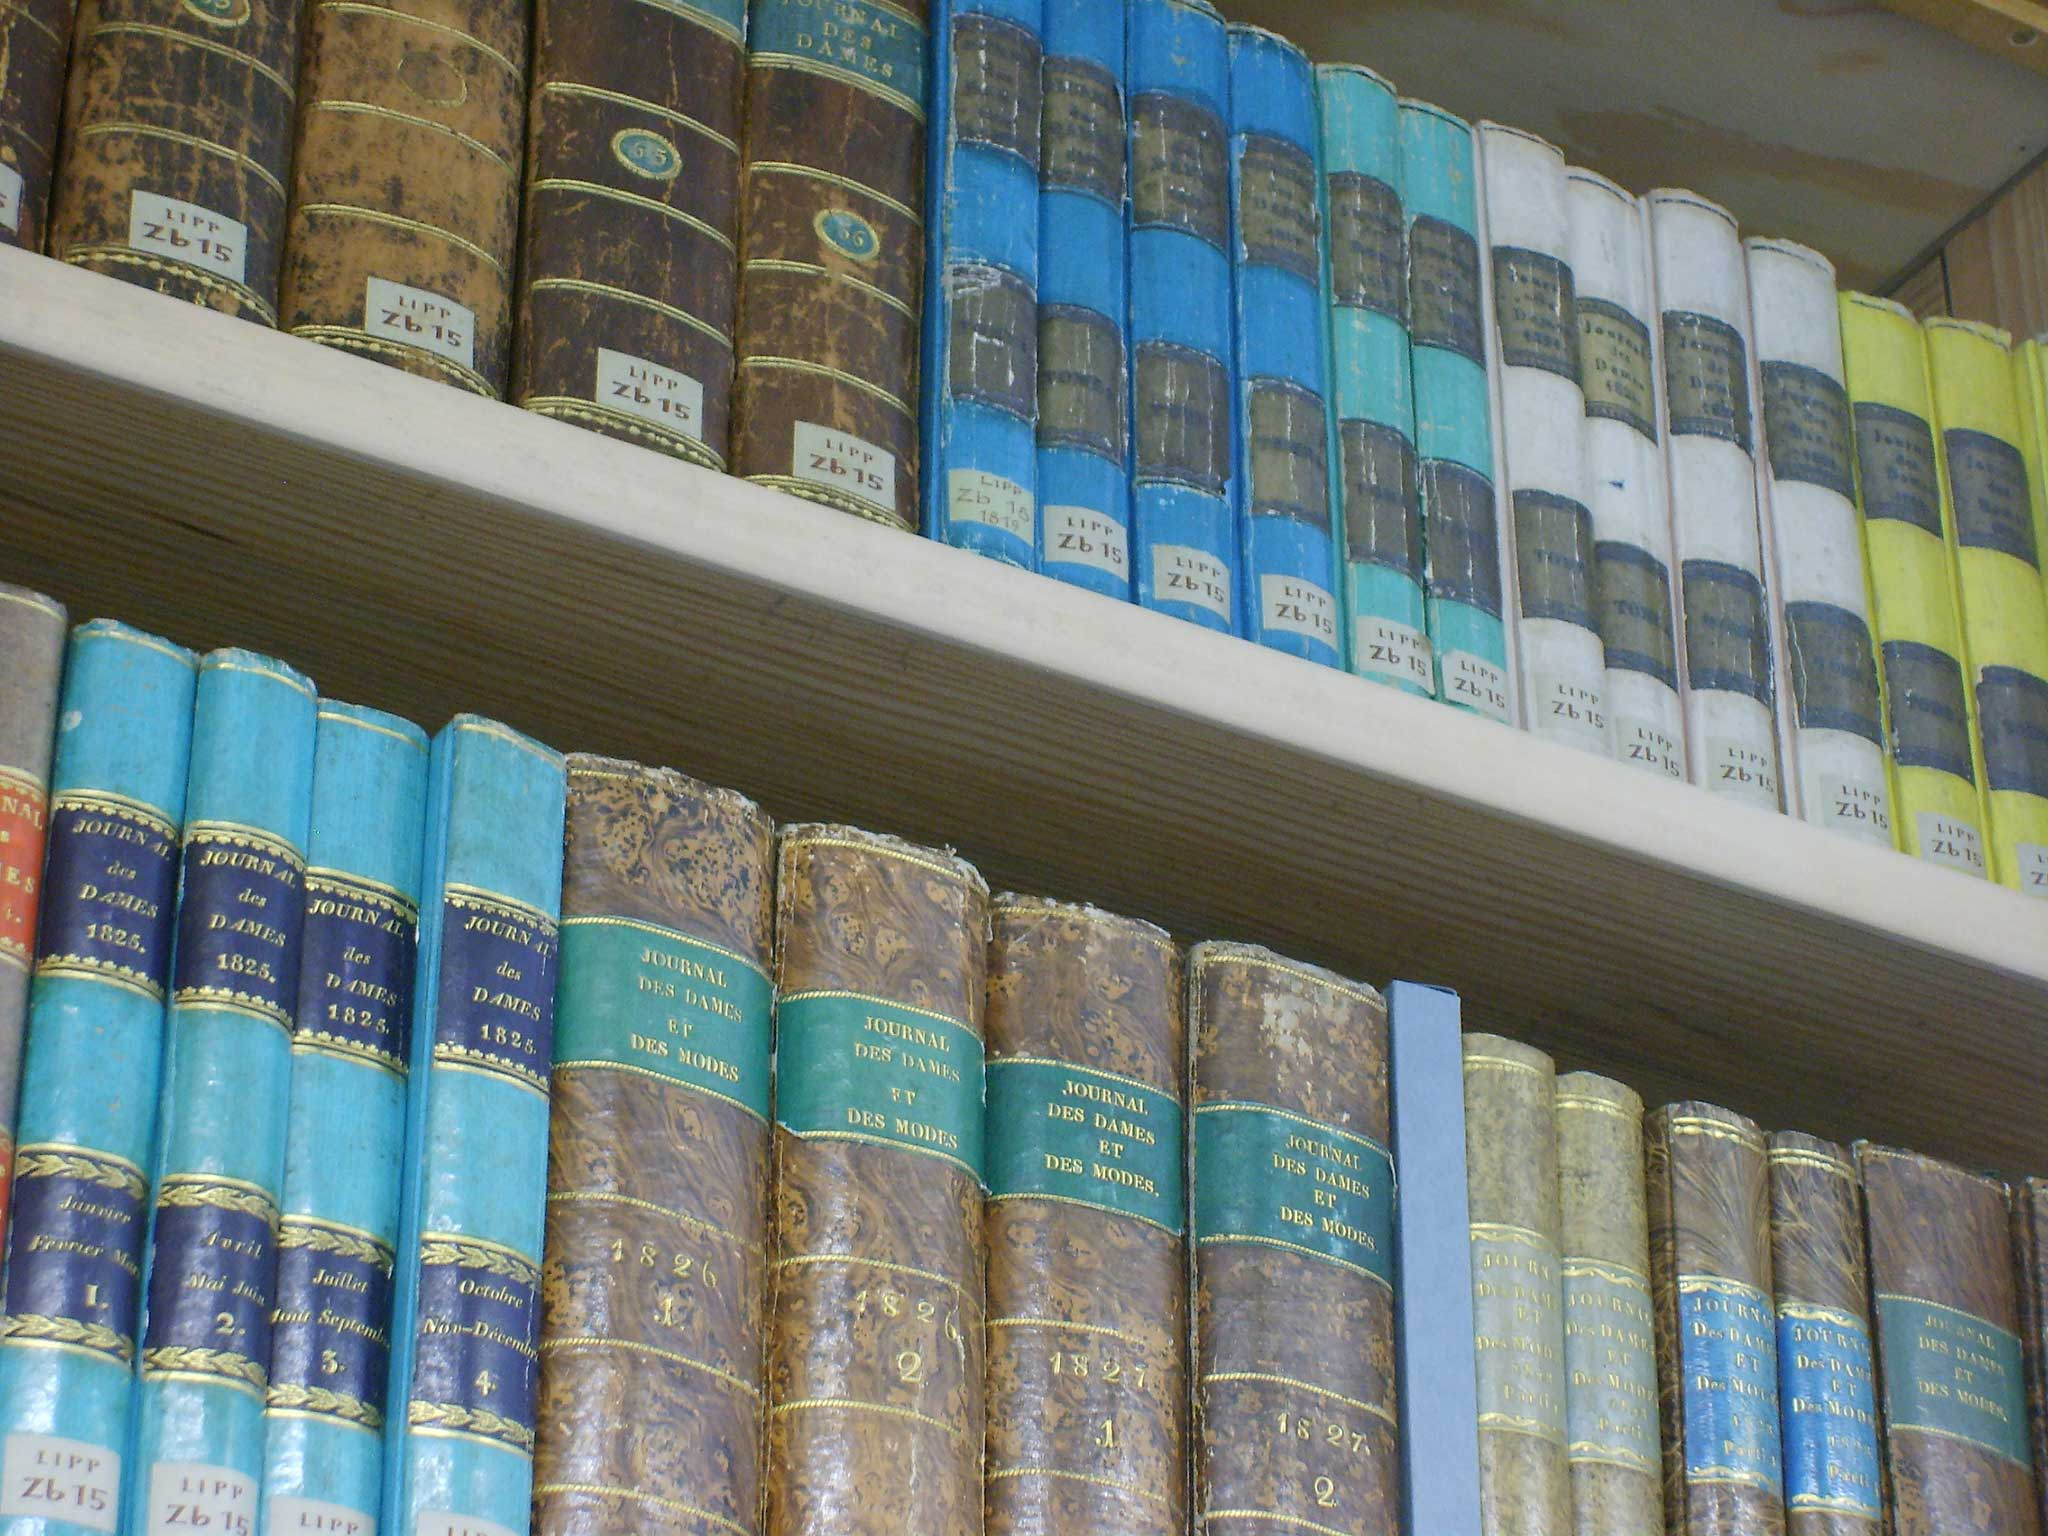 Lipperheidesche Kostümbibliothek  Kunstbibliothek  Staatliche Museen zu Berlin